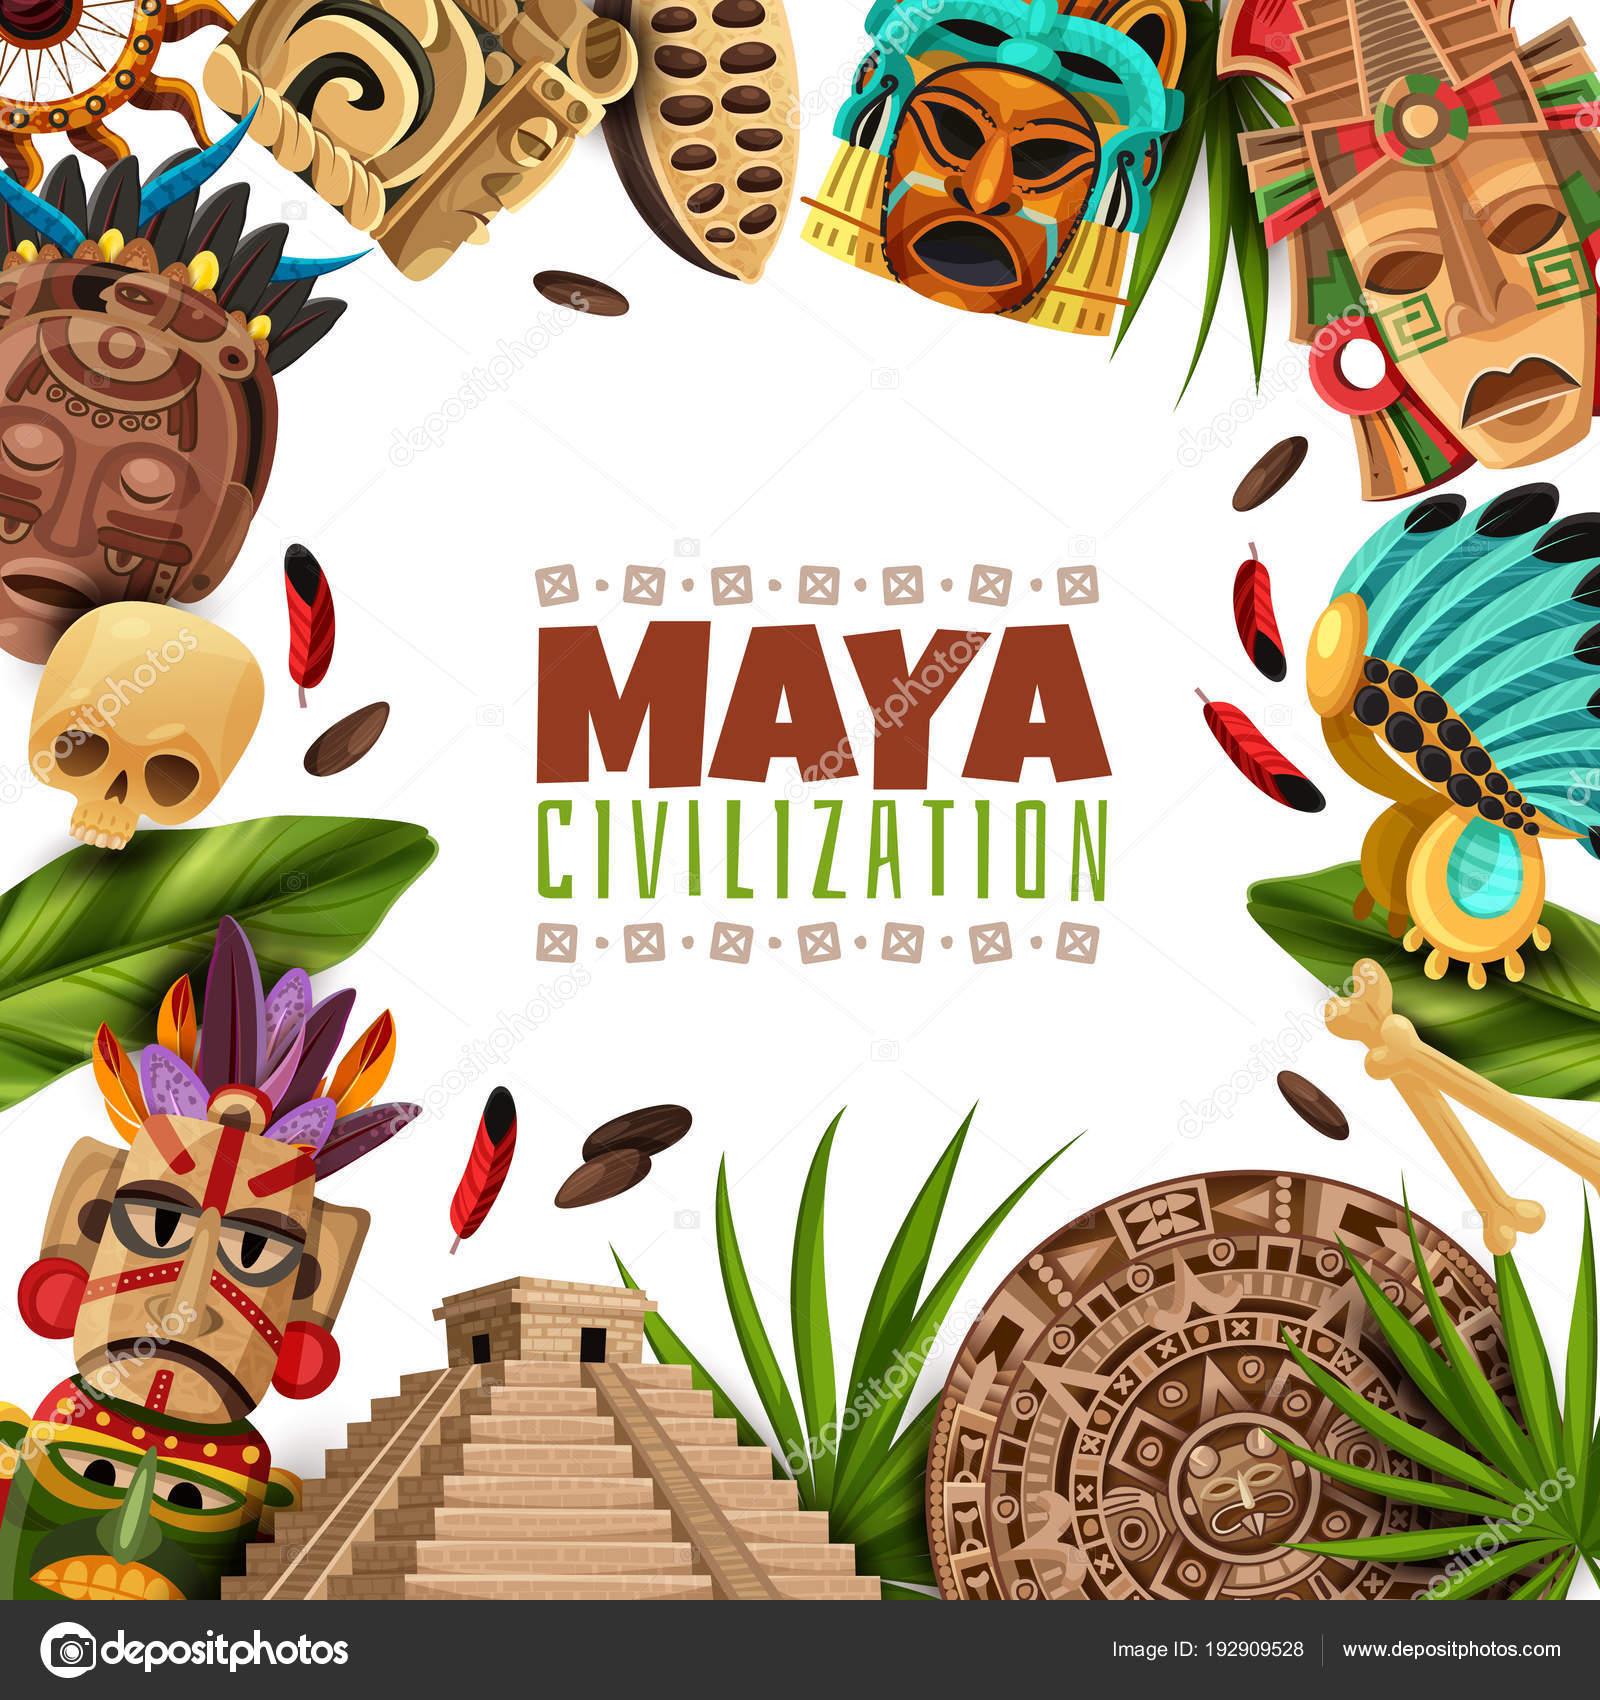 Calendrier Maya Dessin.La Civilisation Maya Dessin Anime Image Image Vectorielle